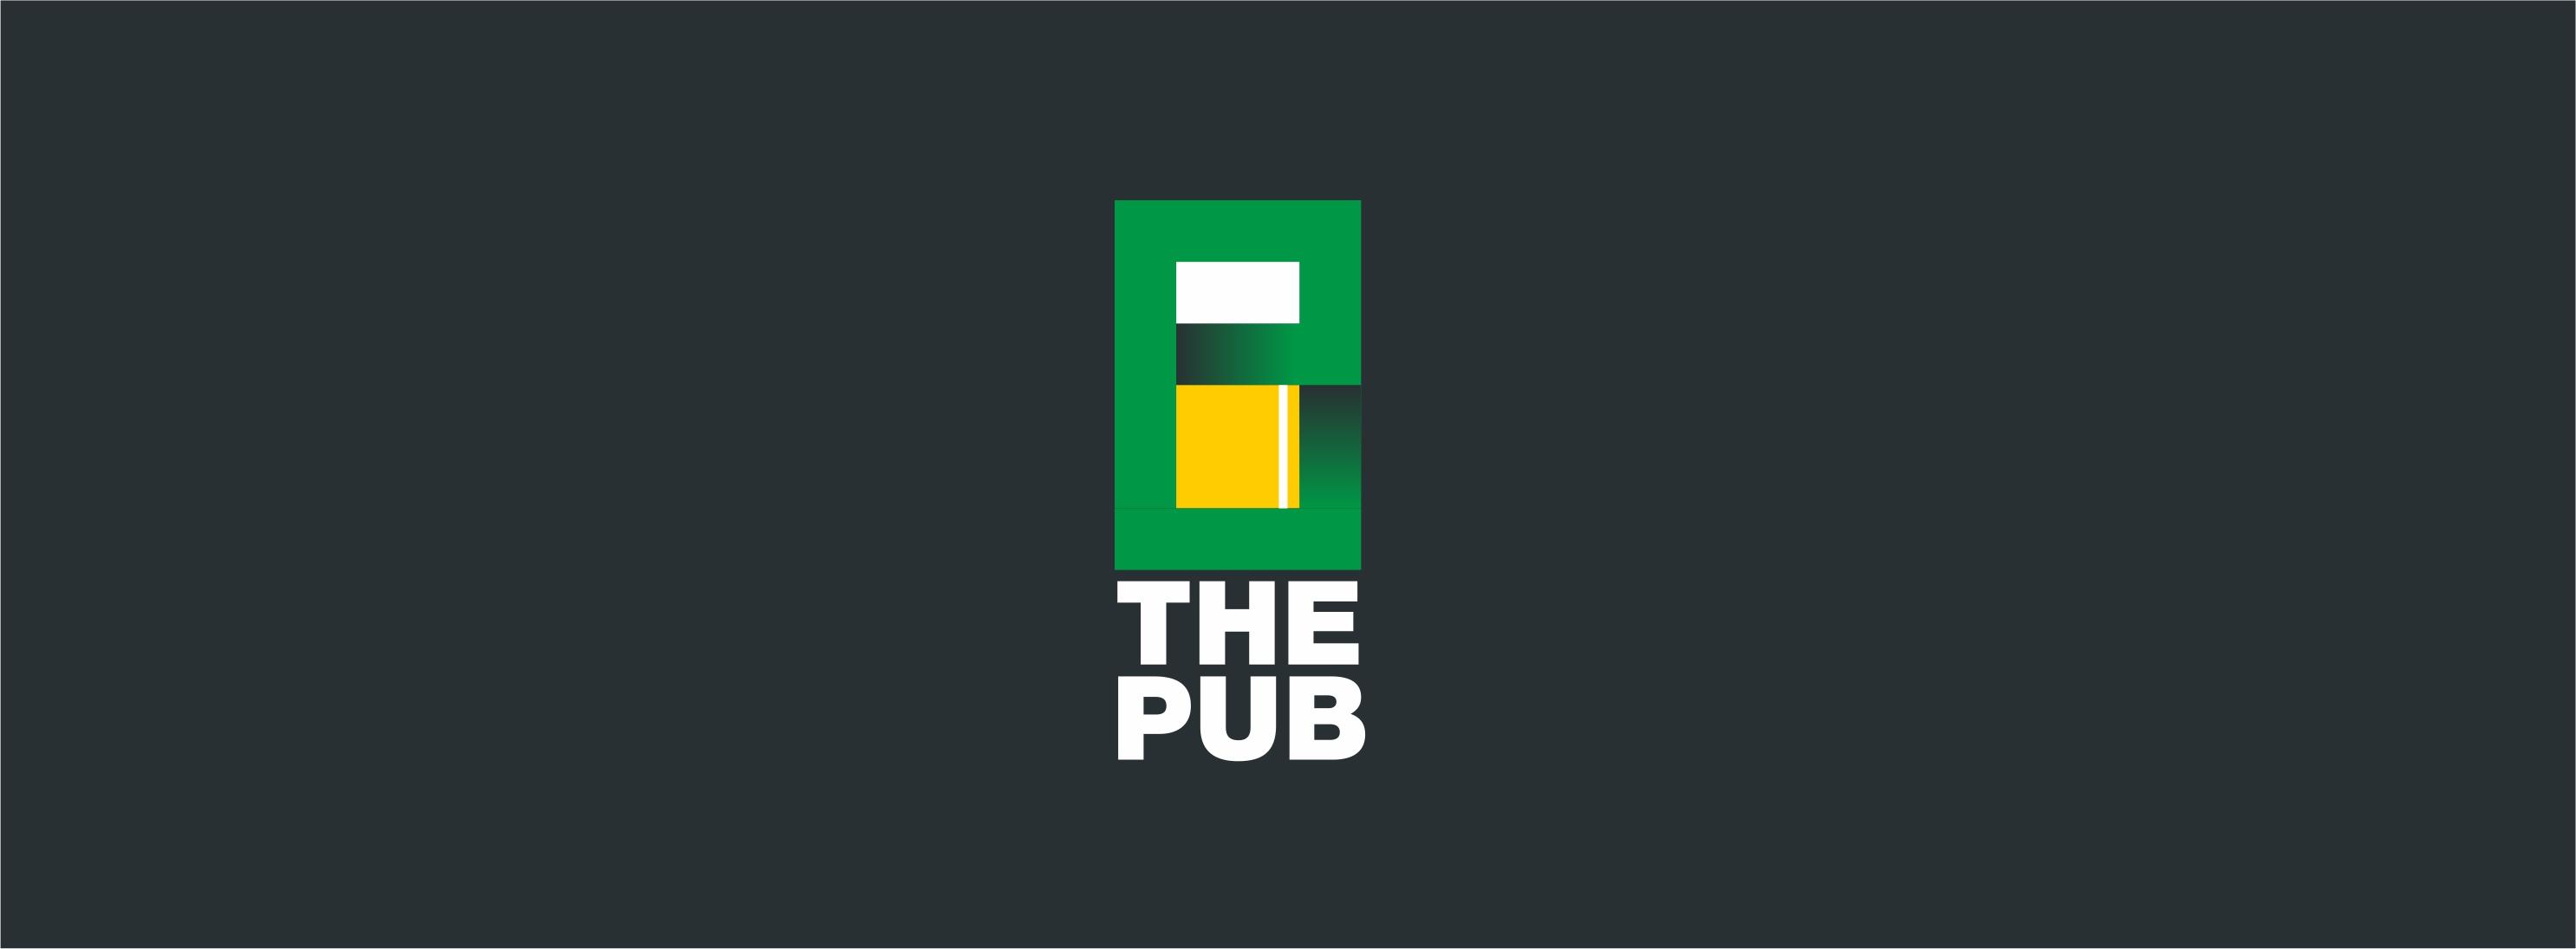 "Разработка логотипа торговой марки ""THEPUB"" фото f_69251e18e9c7cb72.jpg"